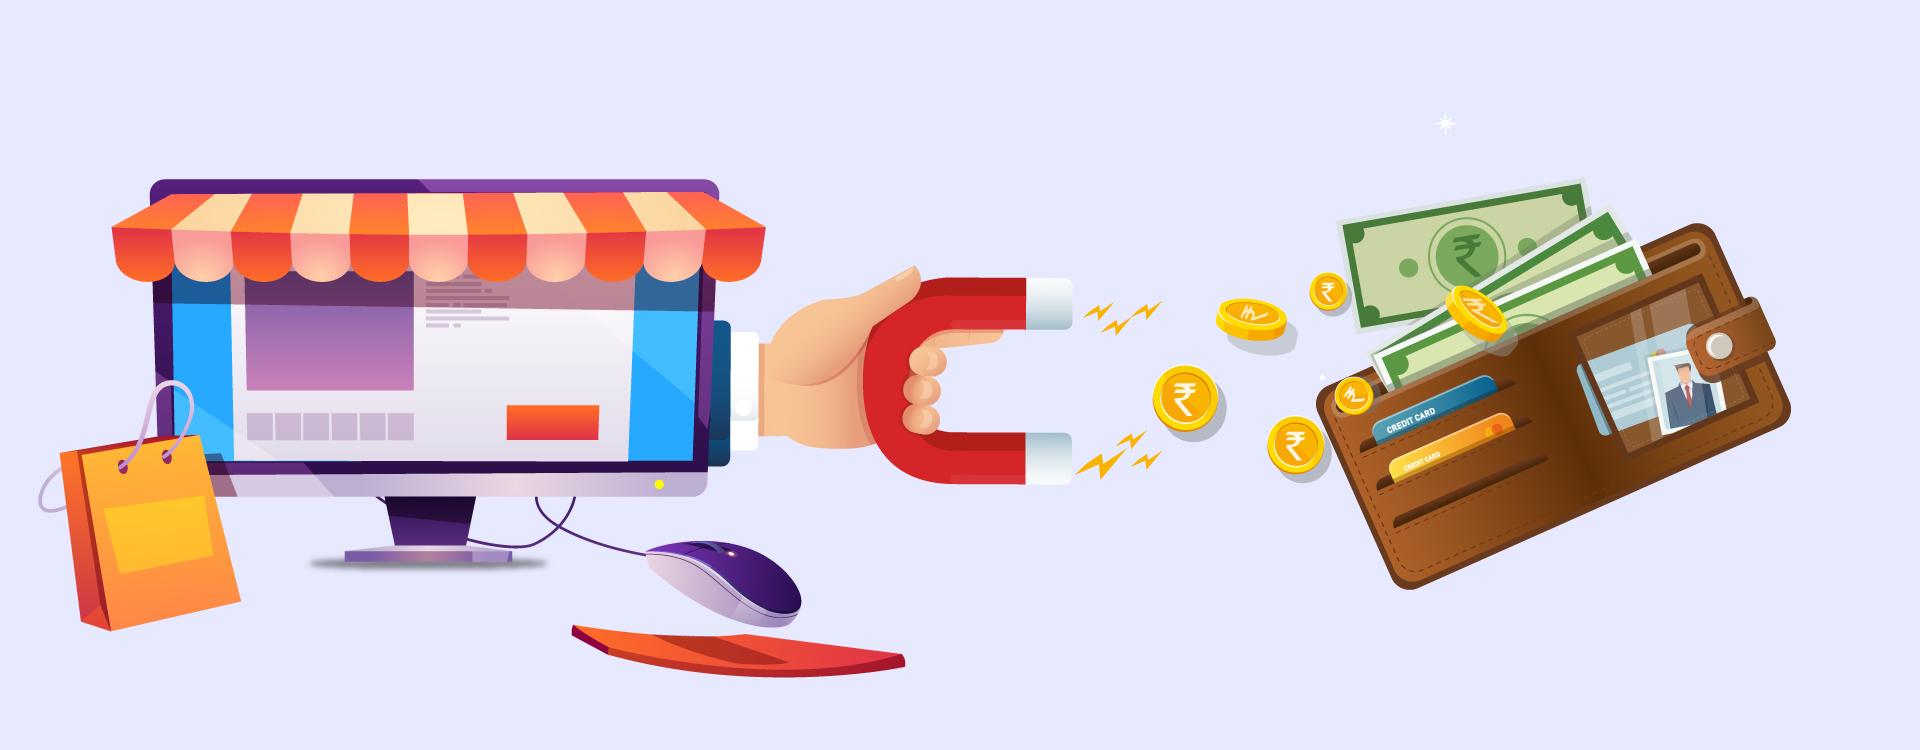 Investors find interest in funding D2C startups